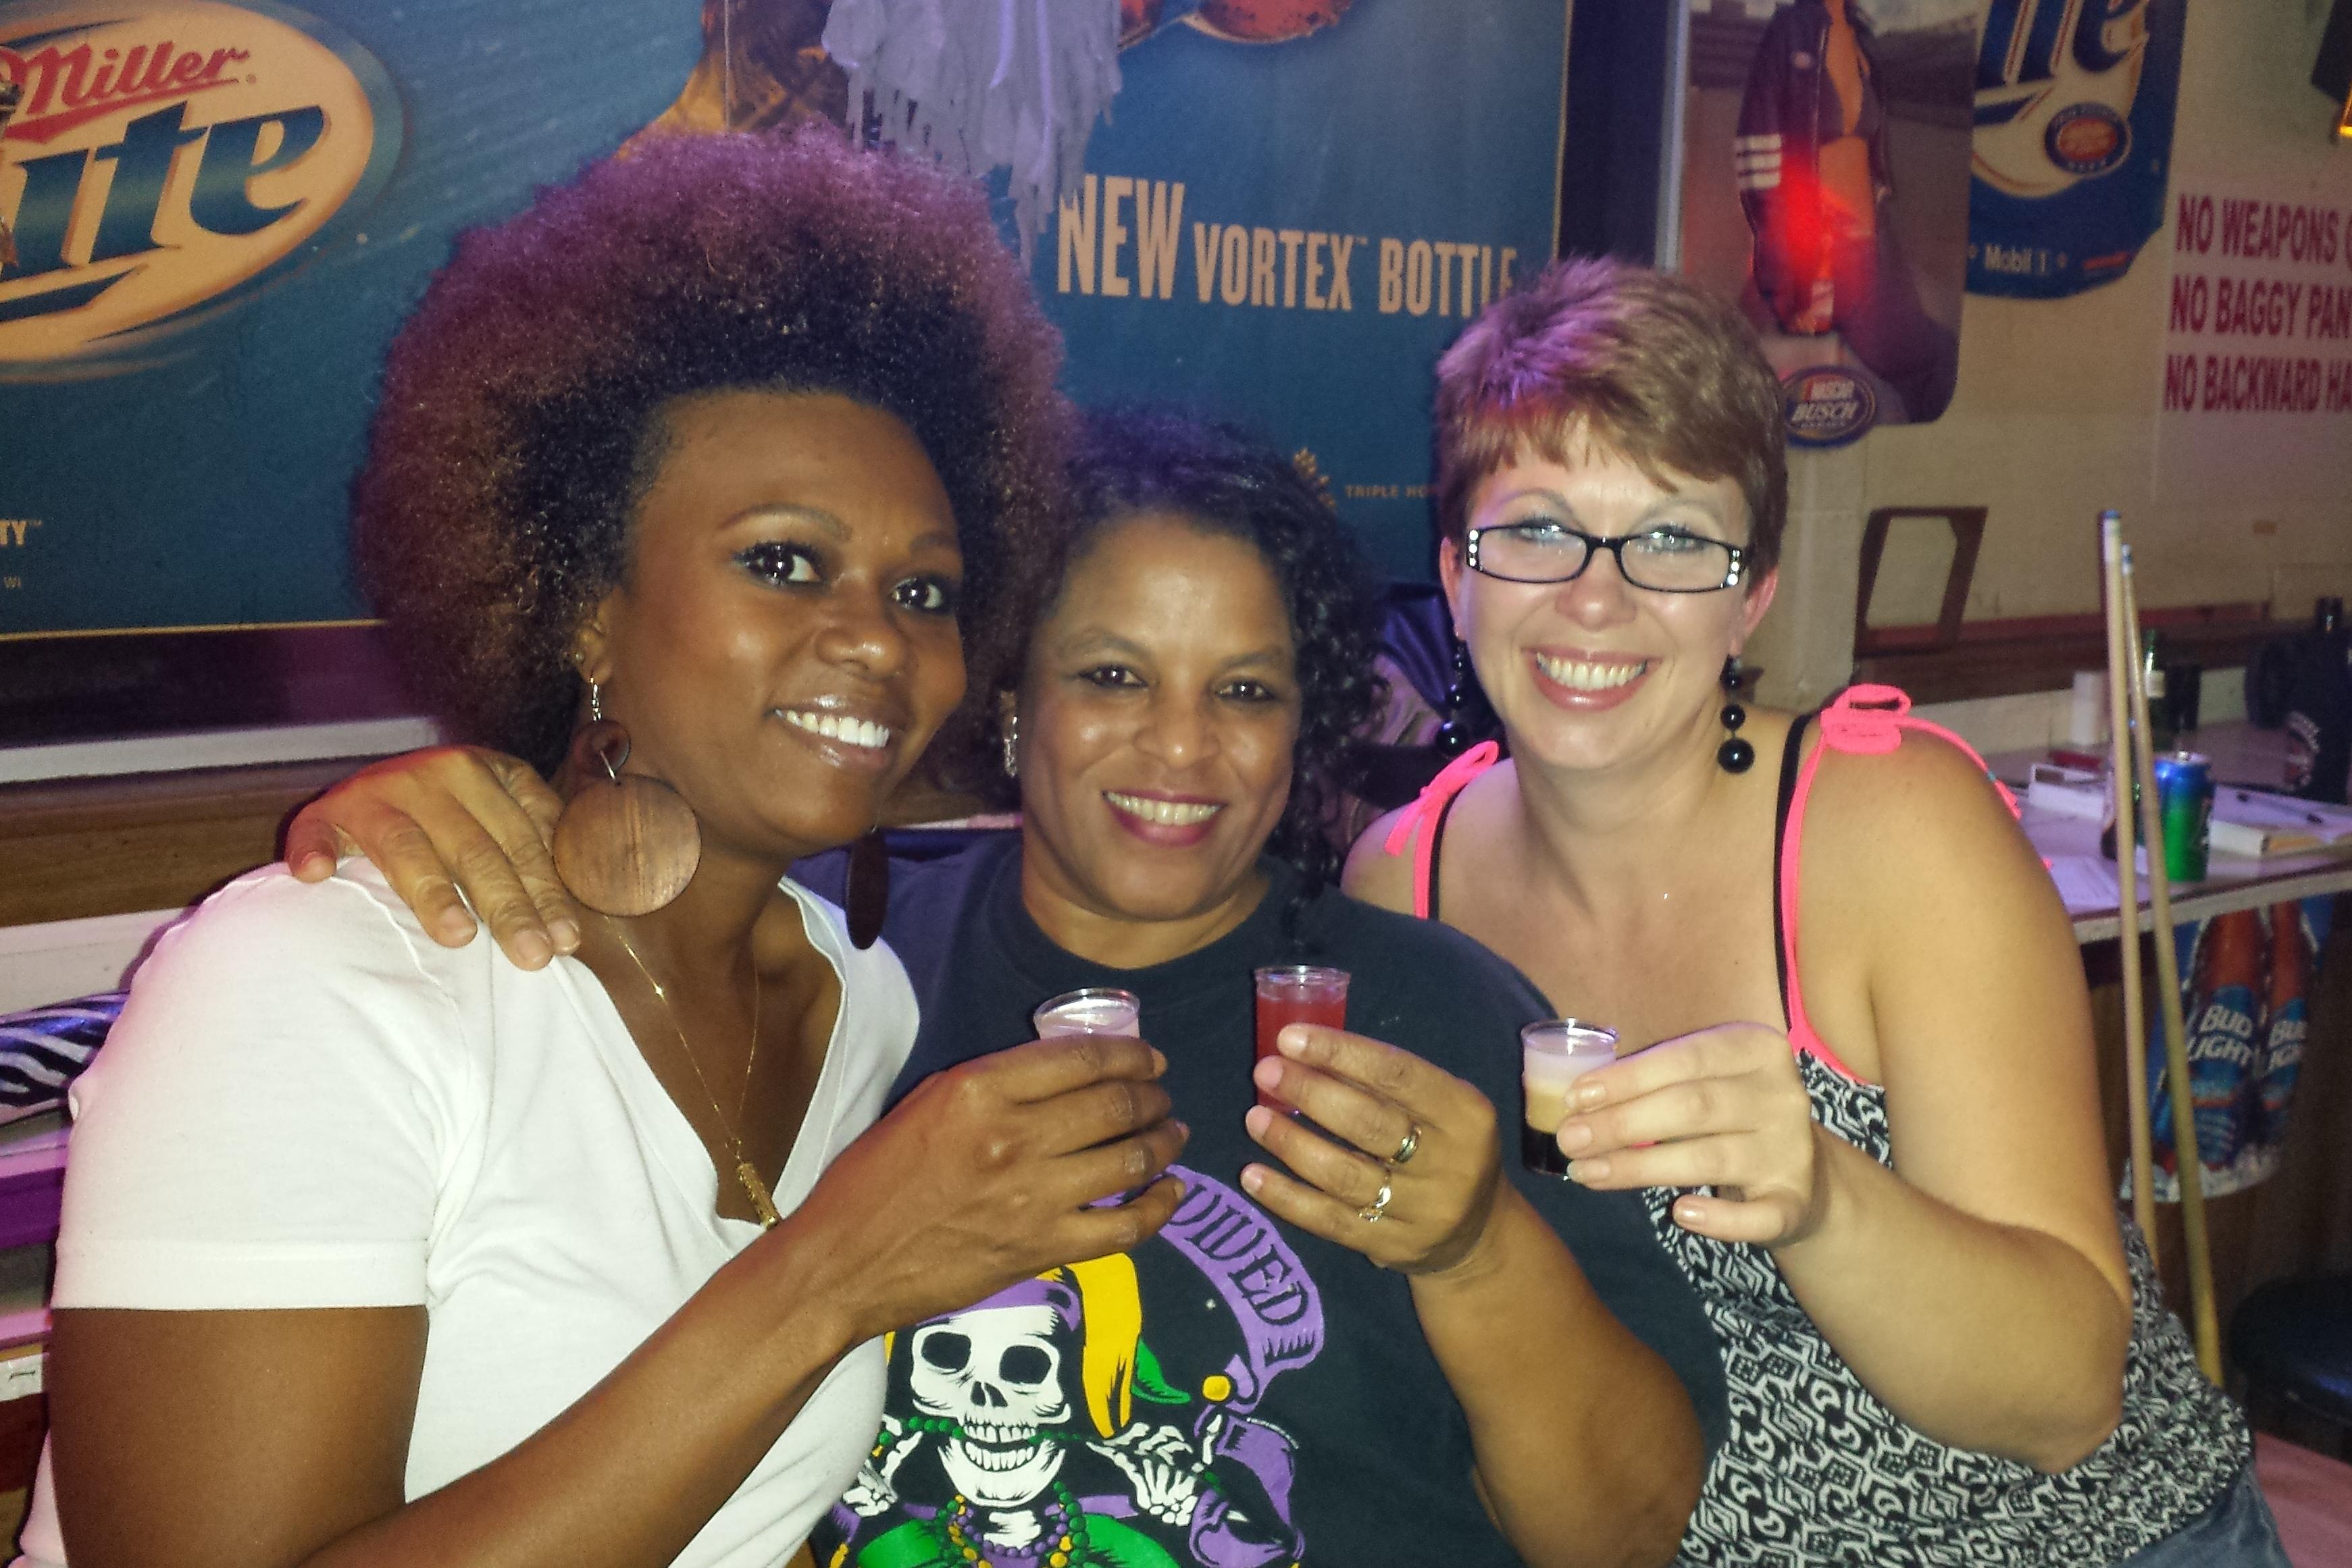 Lena, Snuggles & Amy